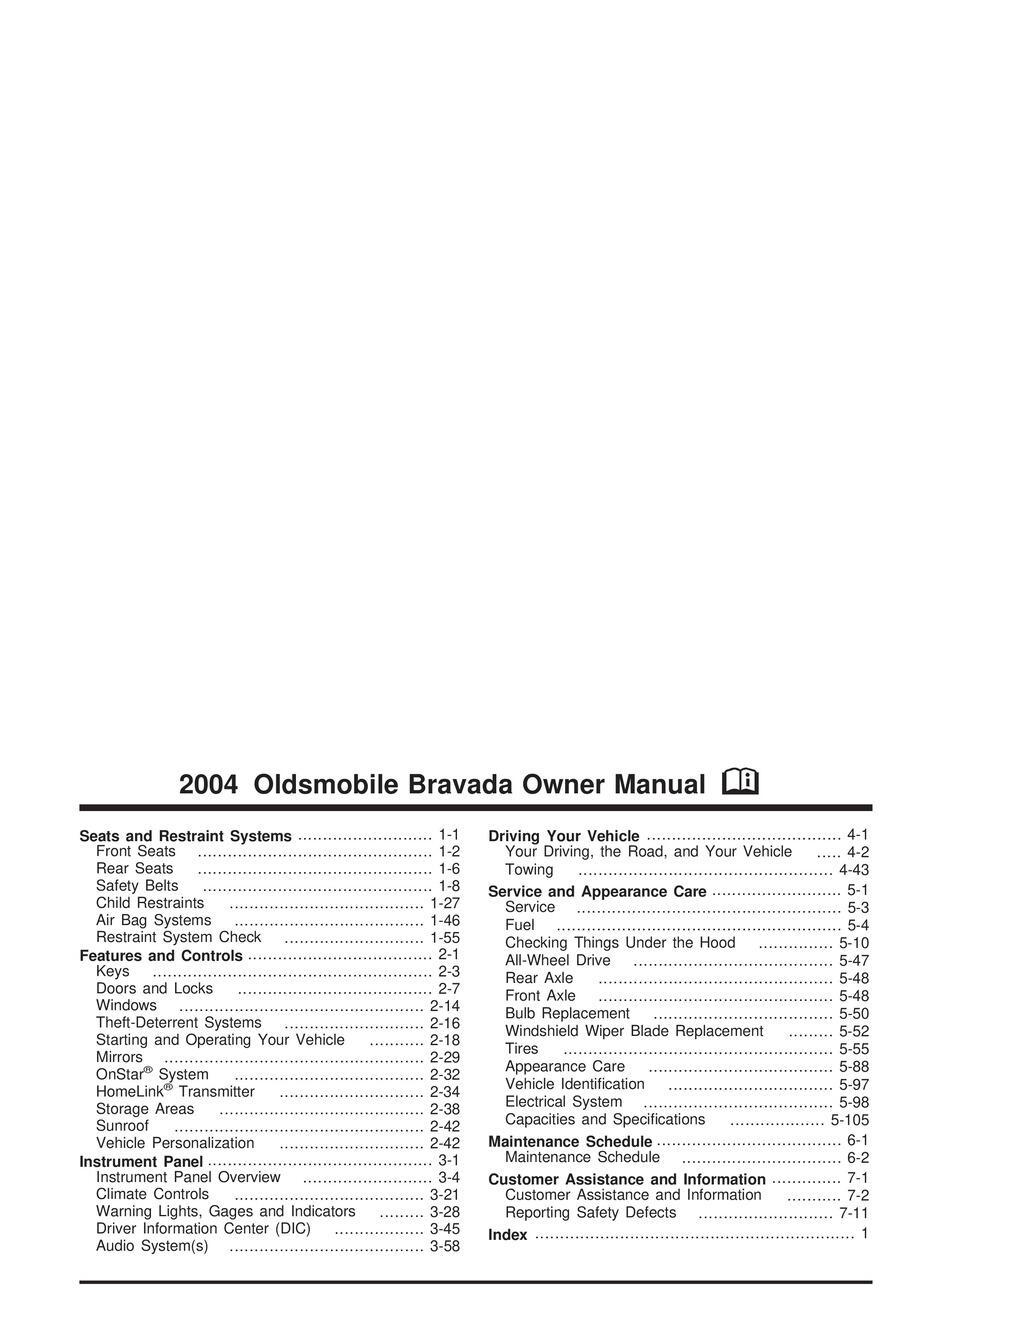 2004 Oldsmobile Bravada owners manual